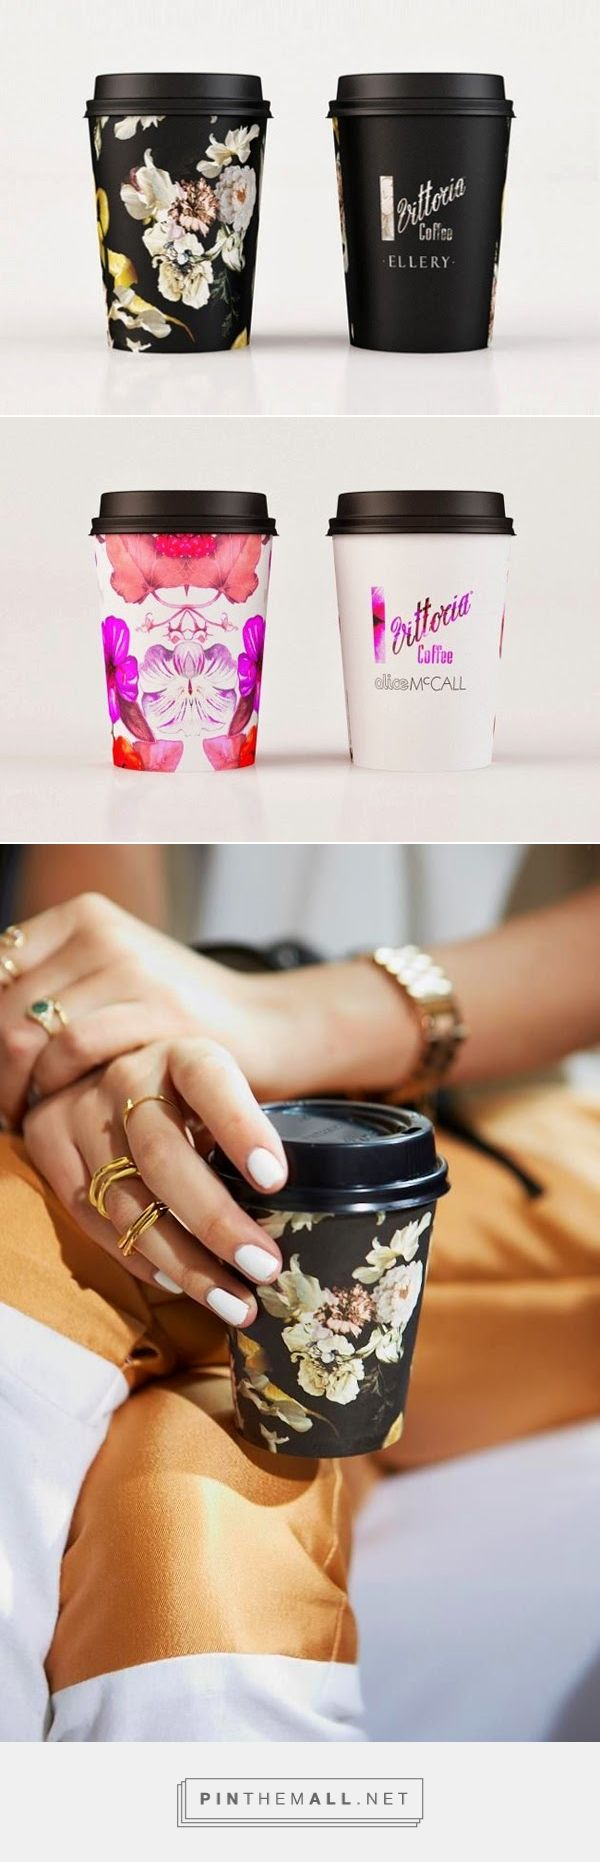 VITTORIA COFFEE X MBAFW